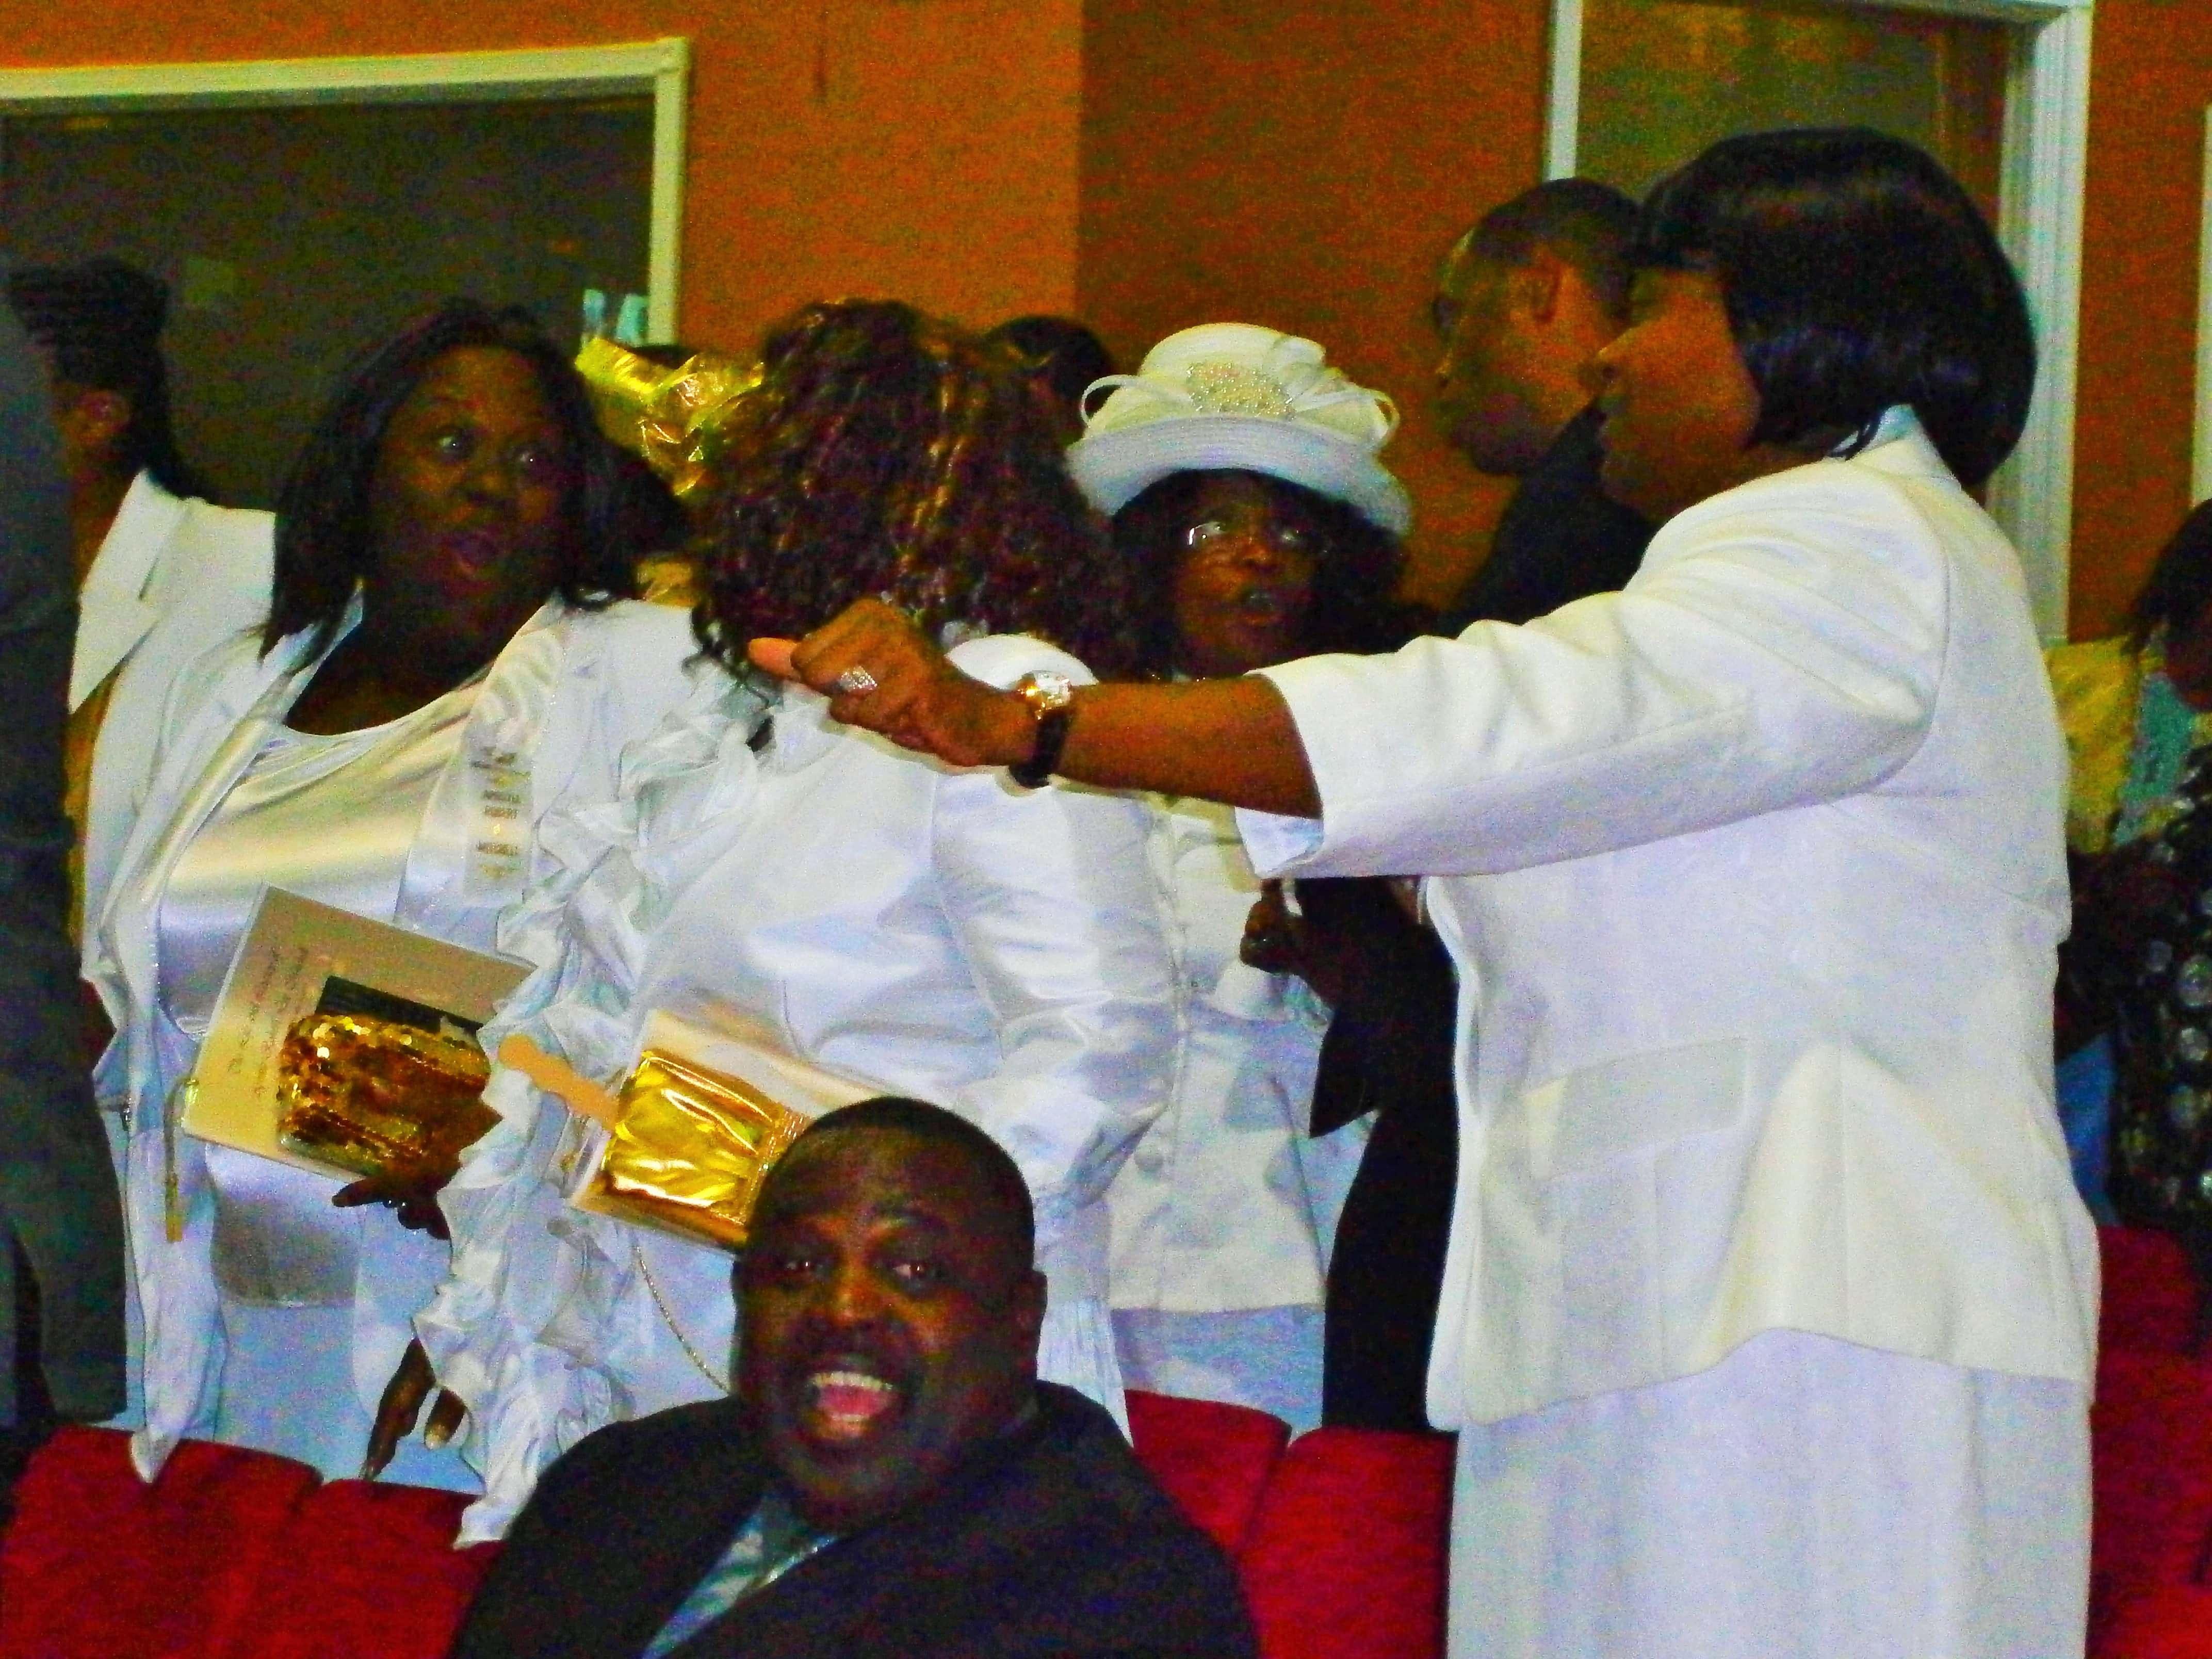 Church Fellowship Service